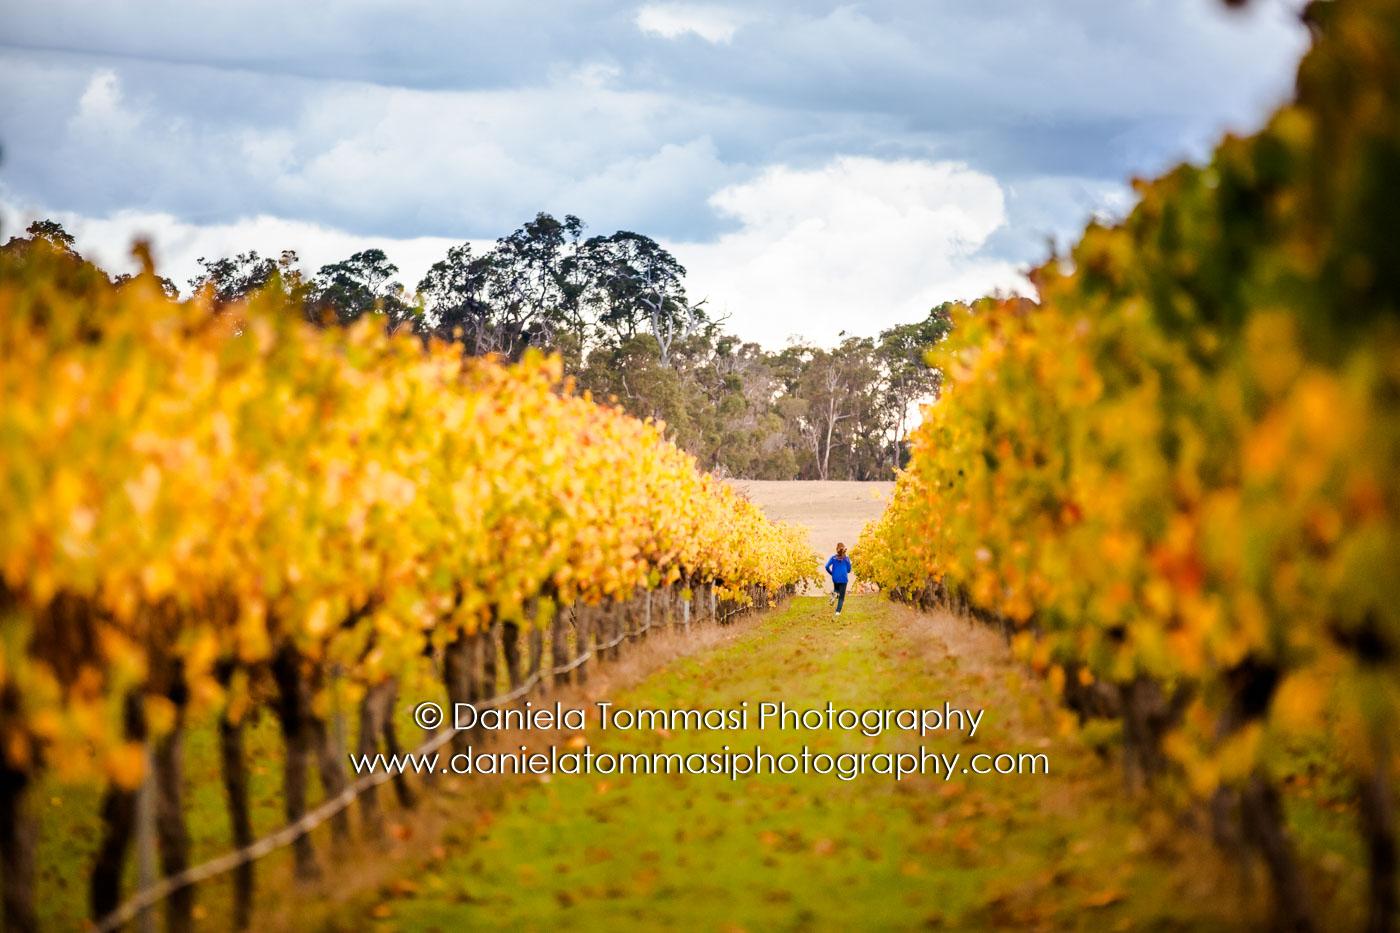 Winery-Daniela Tommasi Photography-12